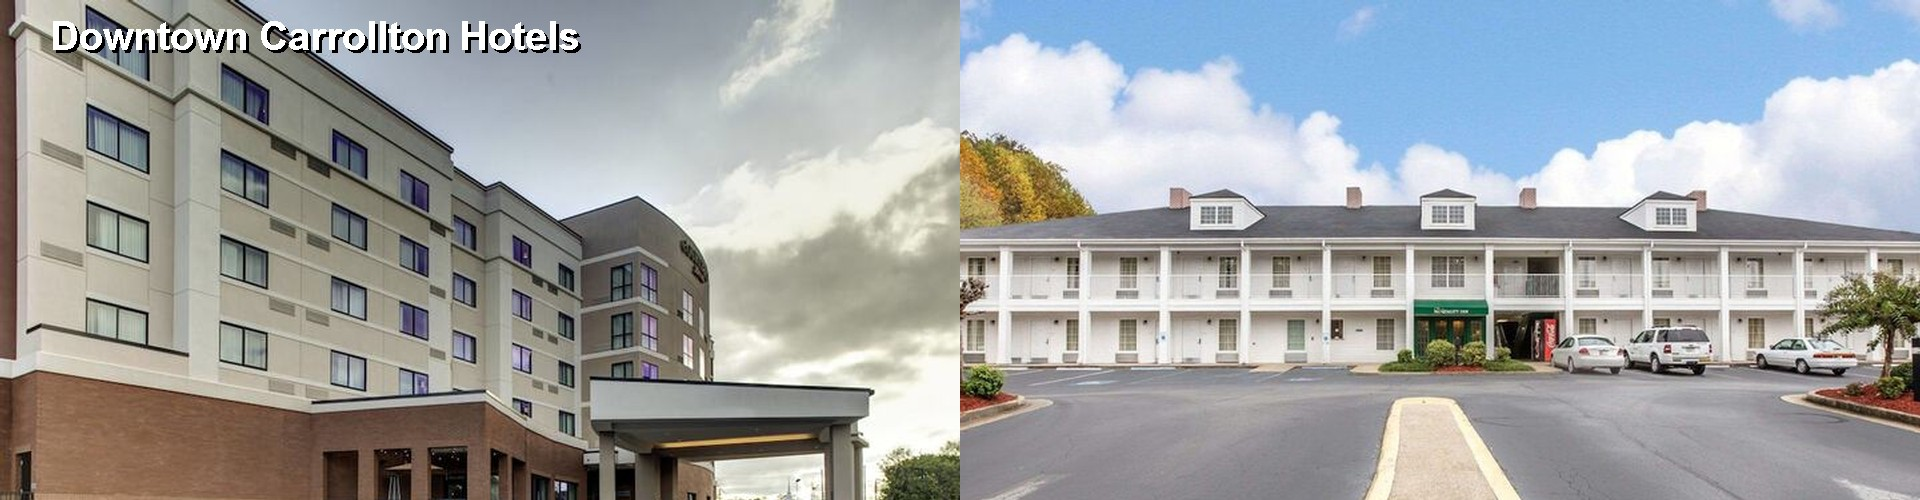 5 Best Hotels Near Downtown Carrollton